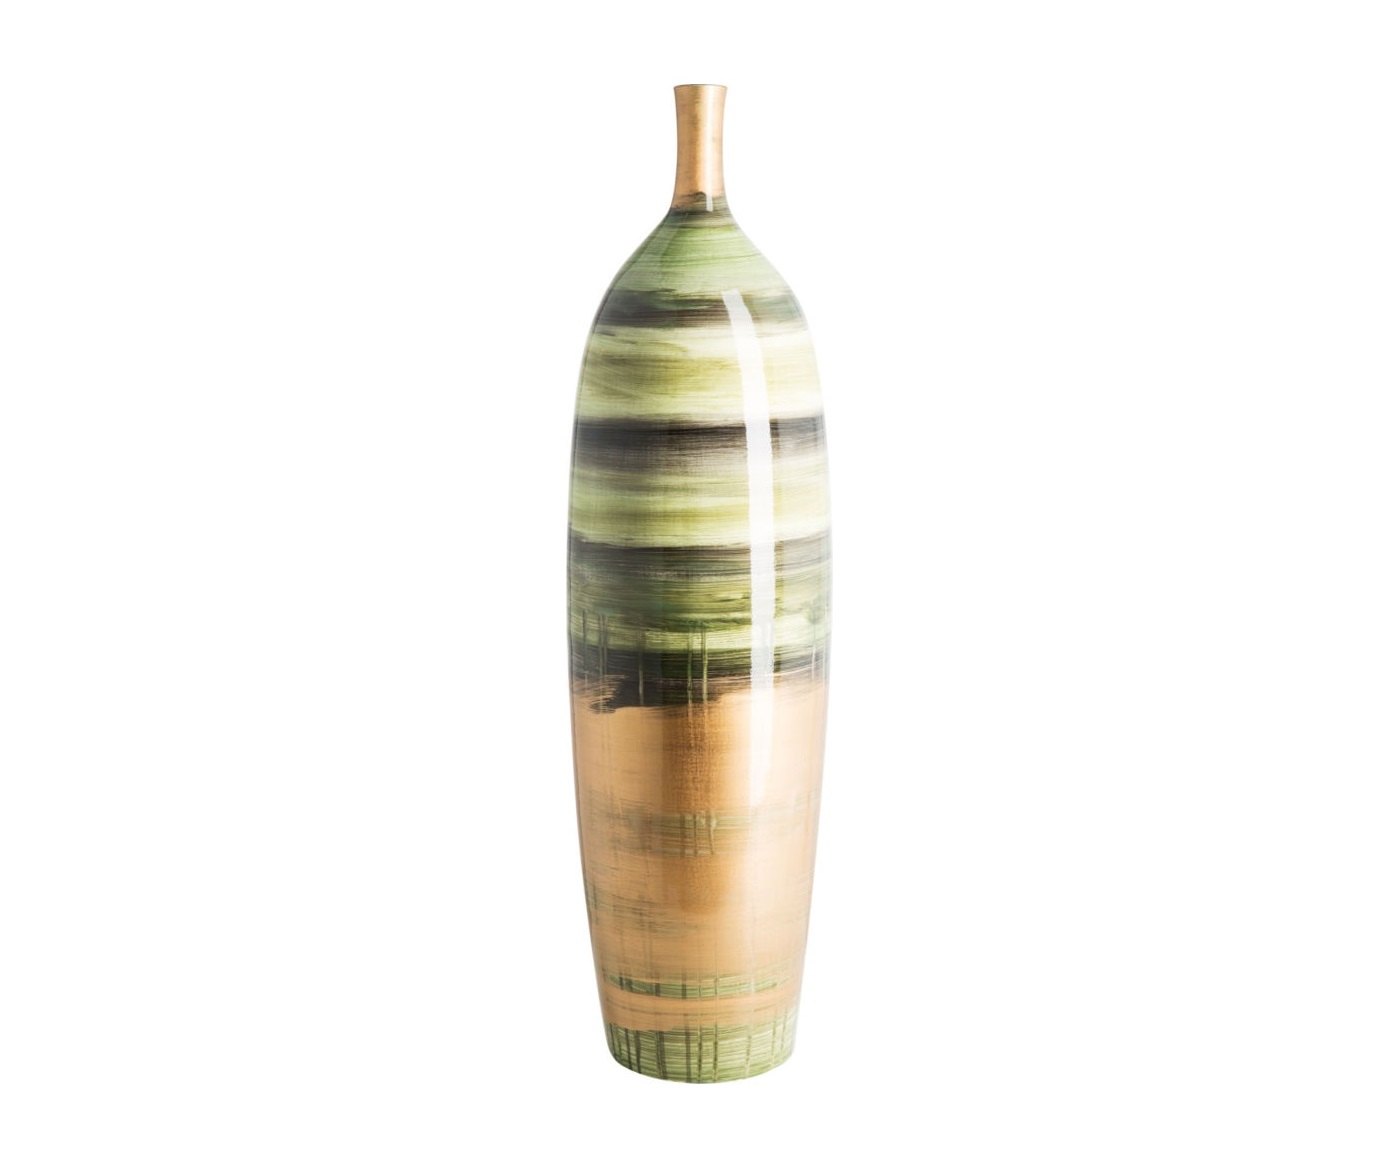 Ваза напольная JupiterВазы<br><br><br>Material: Керамика<br>Ширина см: 21<br>Высота см: 85<br>Глубина см: 21